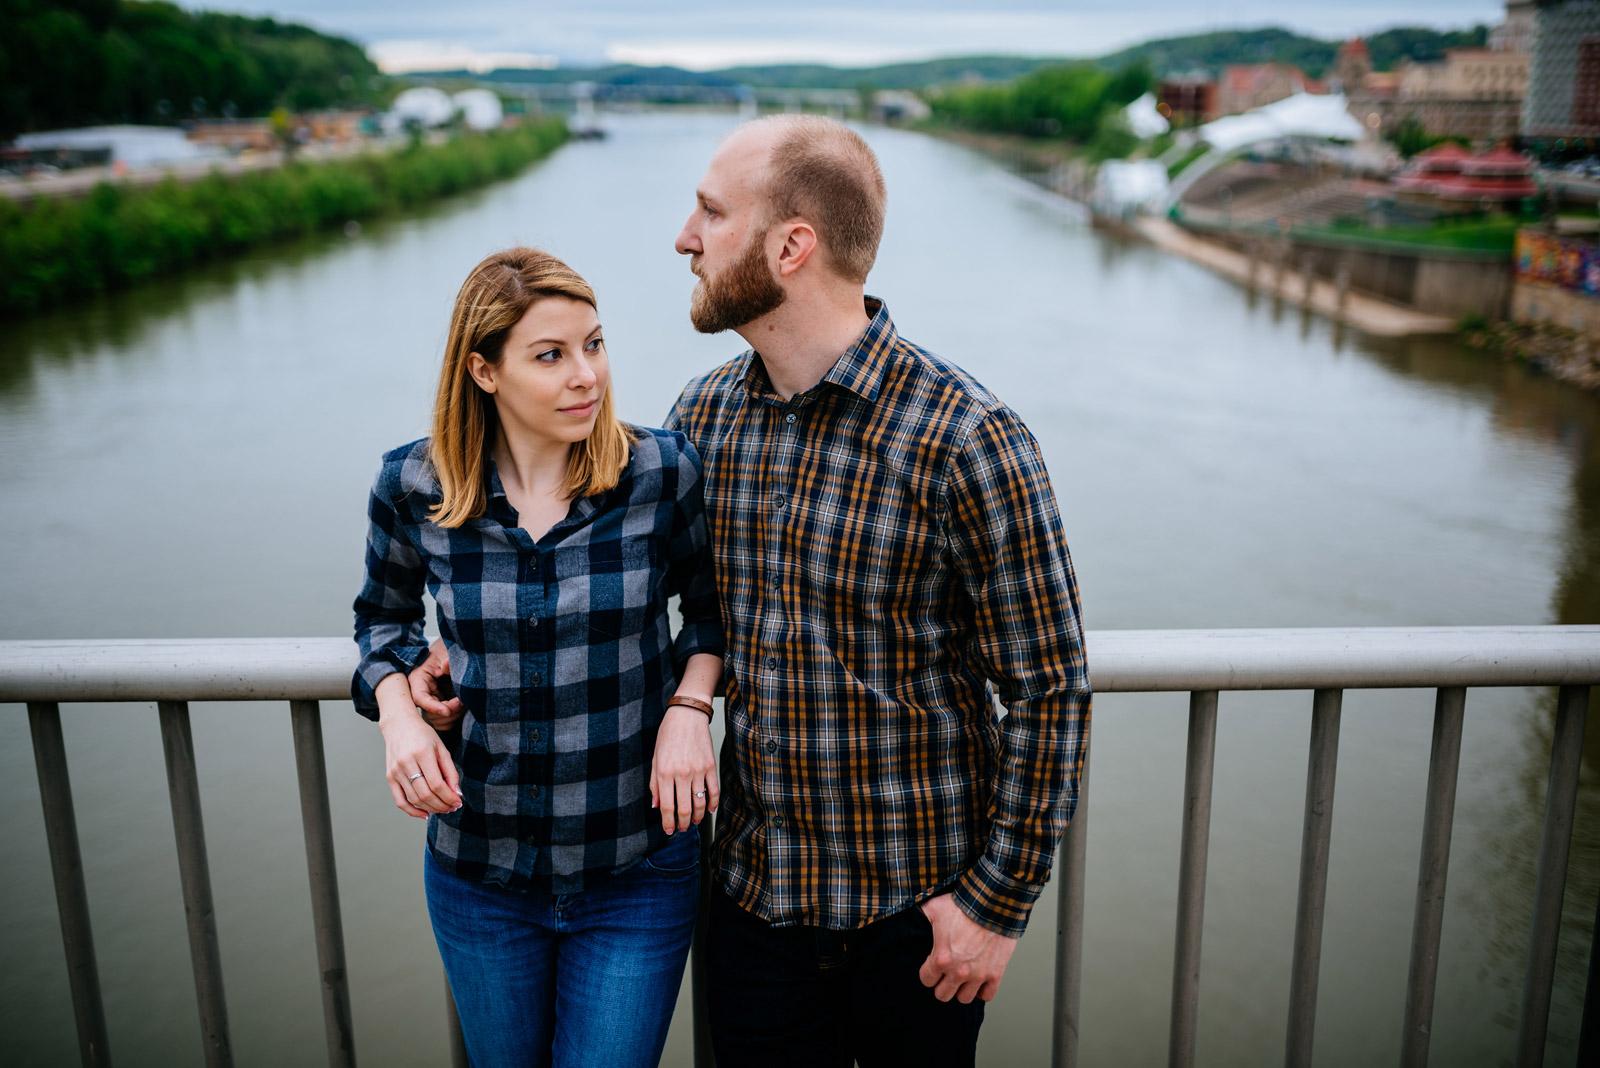 charleston southside bridge engagement portraits